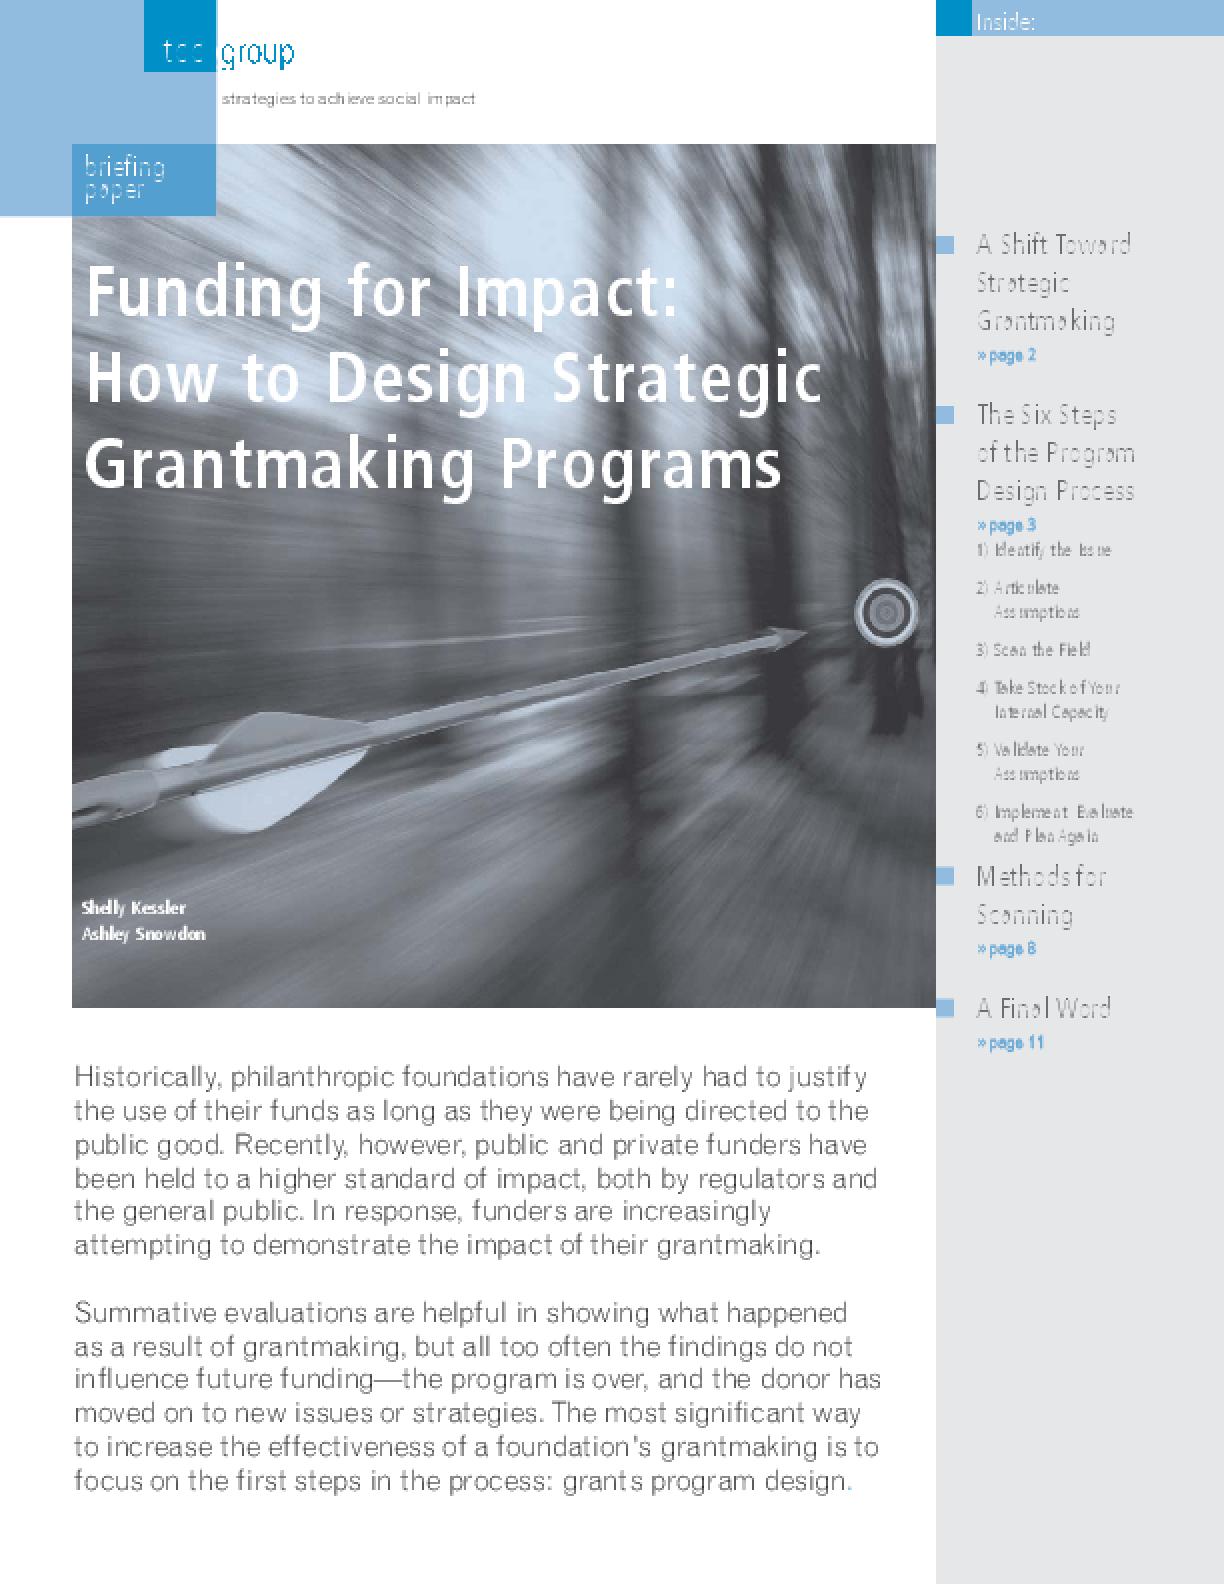 Funding for Impact: How to Design Strategic Grantmaking Programs